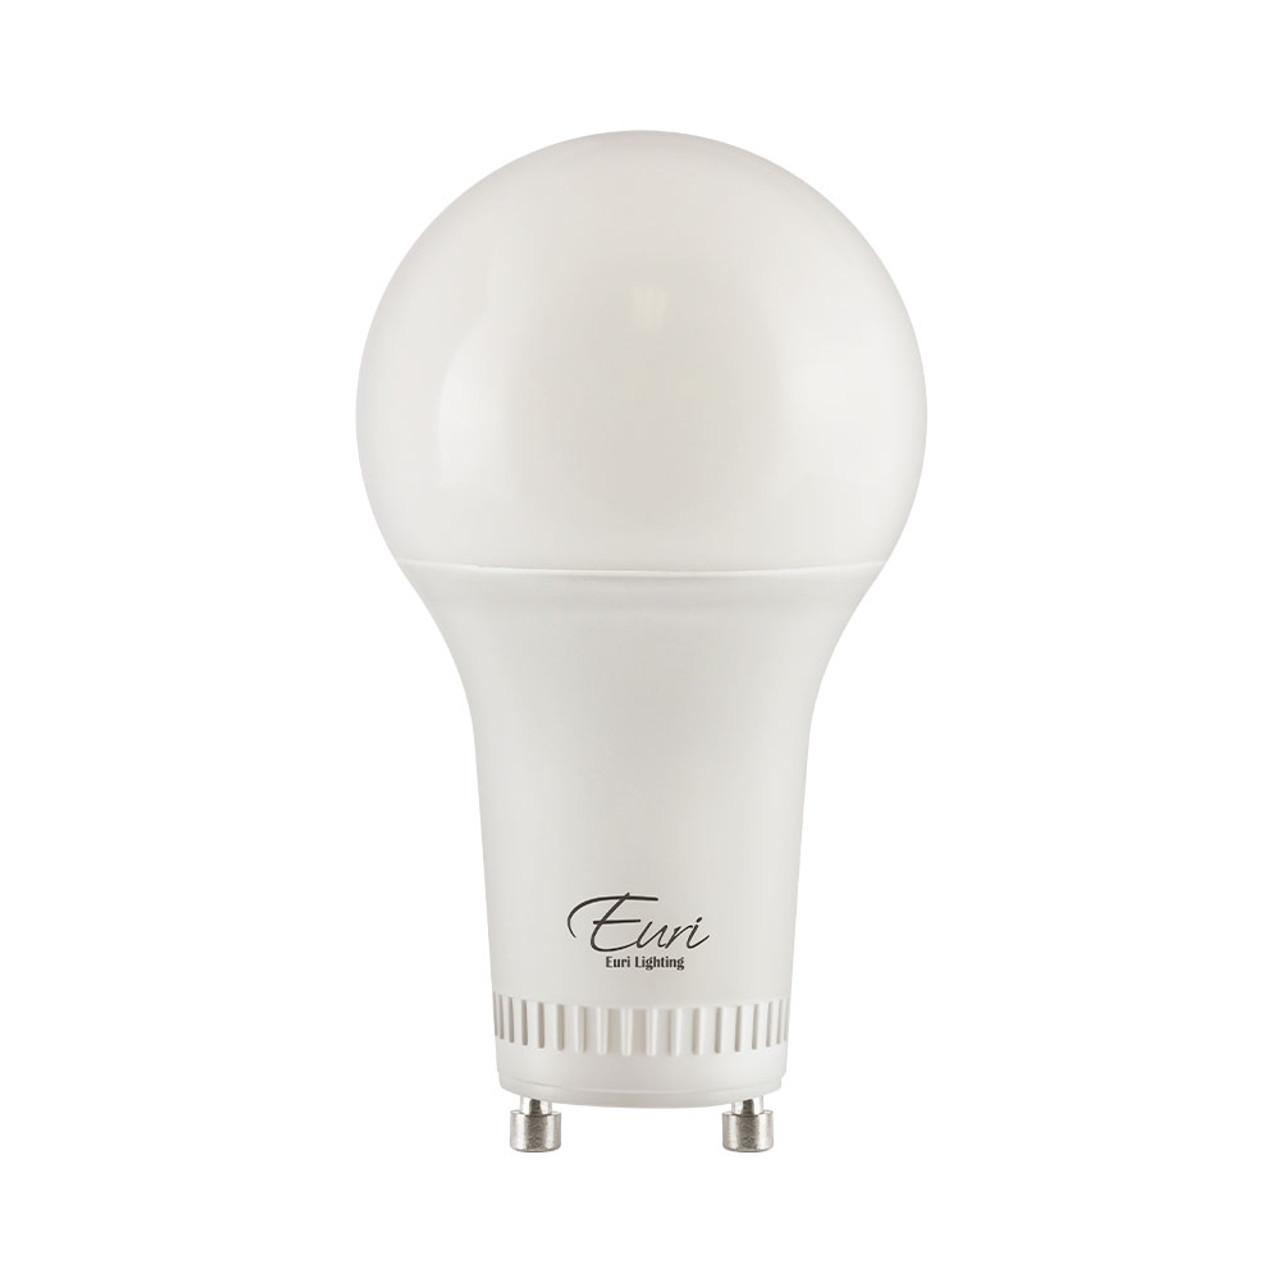 A19, Omni-Directional, LED Light Bulb, Dimmable, 11W, 120V, 1100 lm, 5000K, Value-Pack (Qty. 2), GU24 Base (EA19-11W2050eG-2)